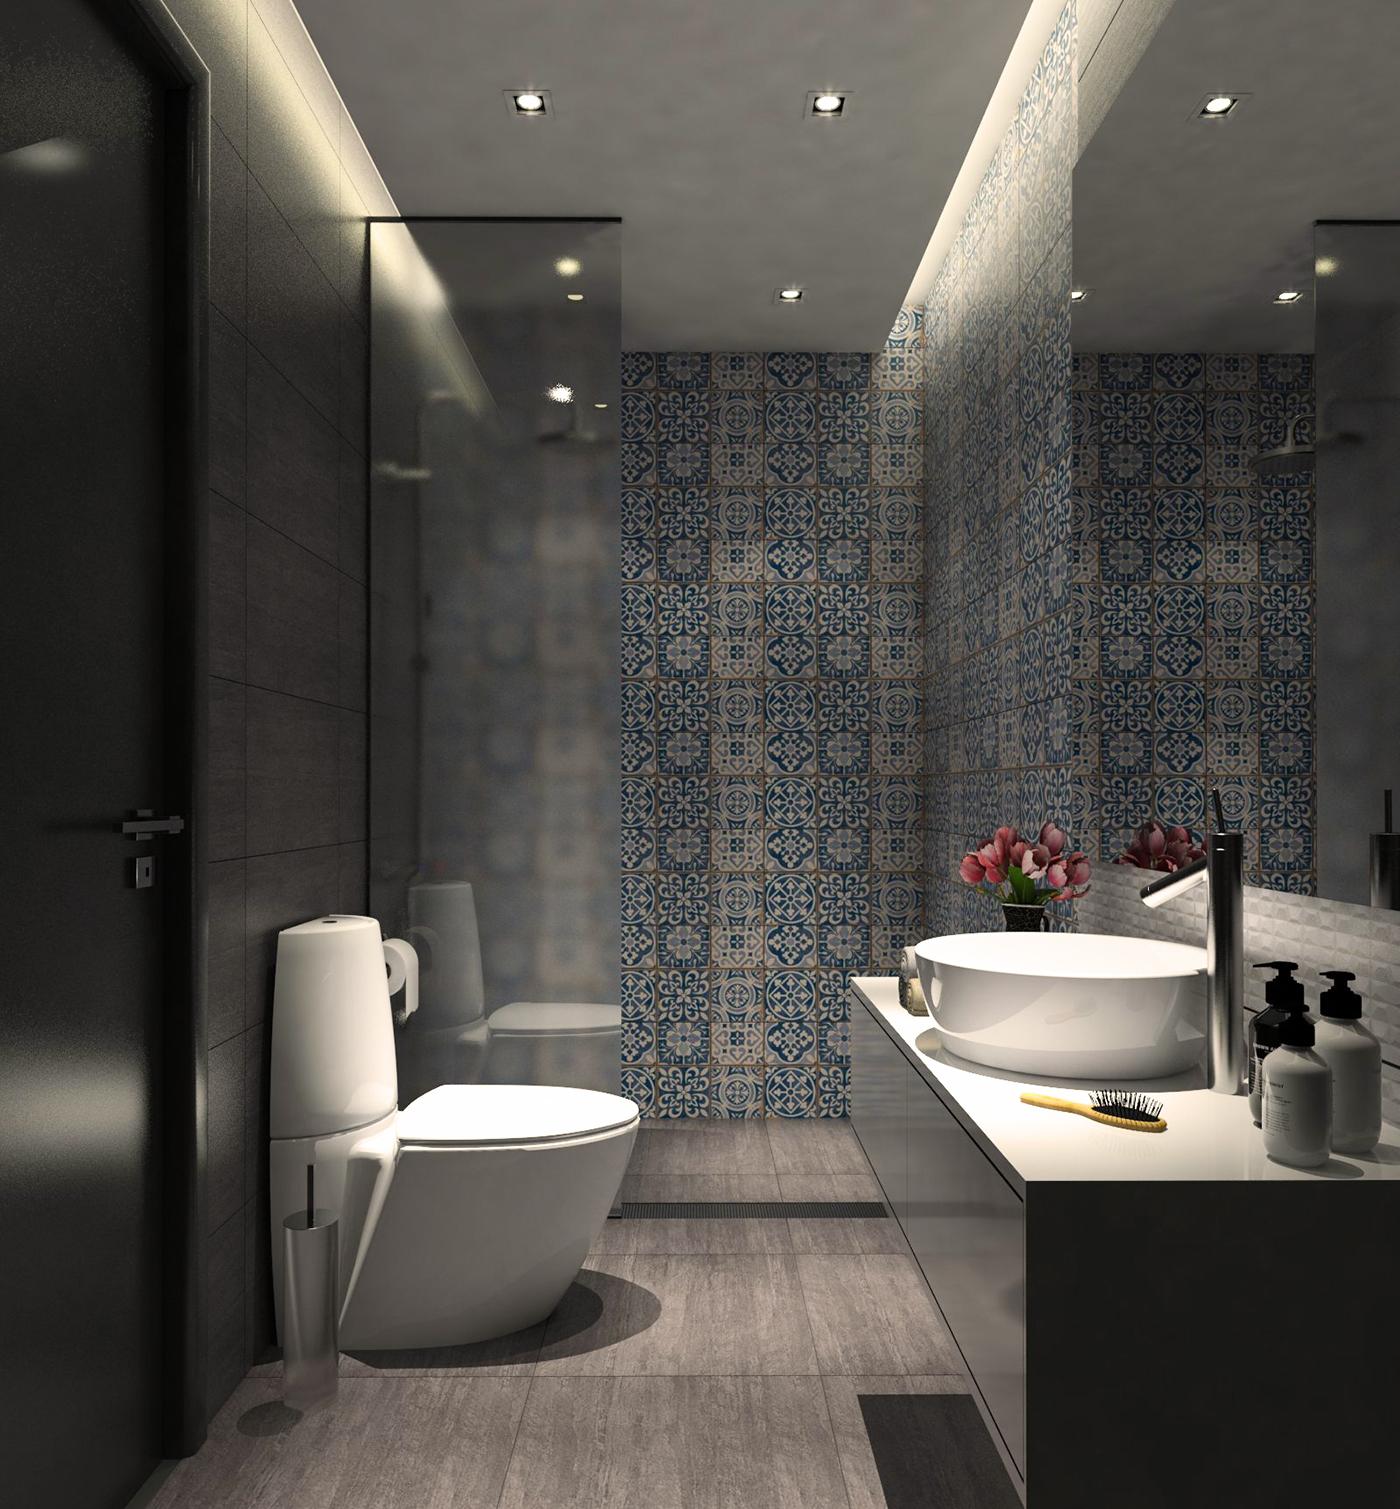 Small dark bathroom vray training on behance for Bagno piccolo design